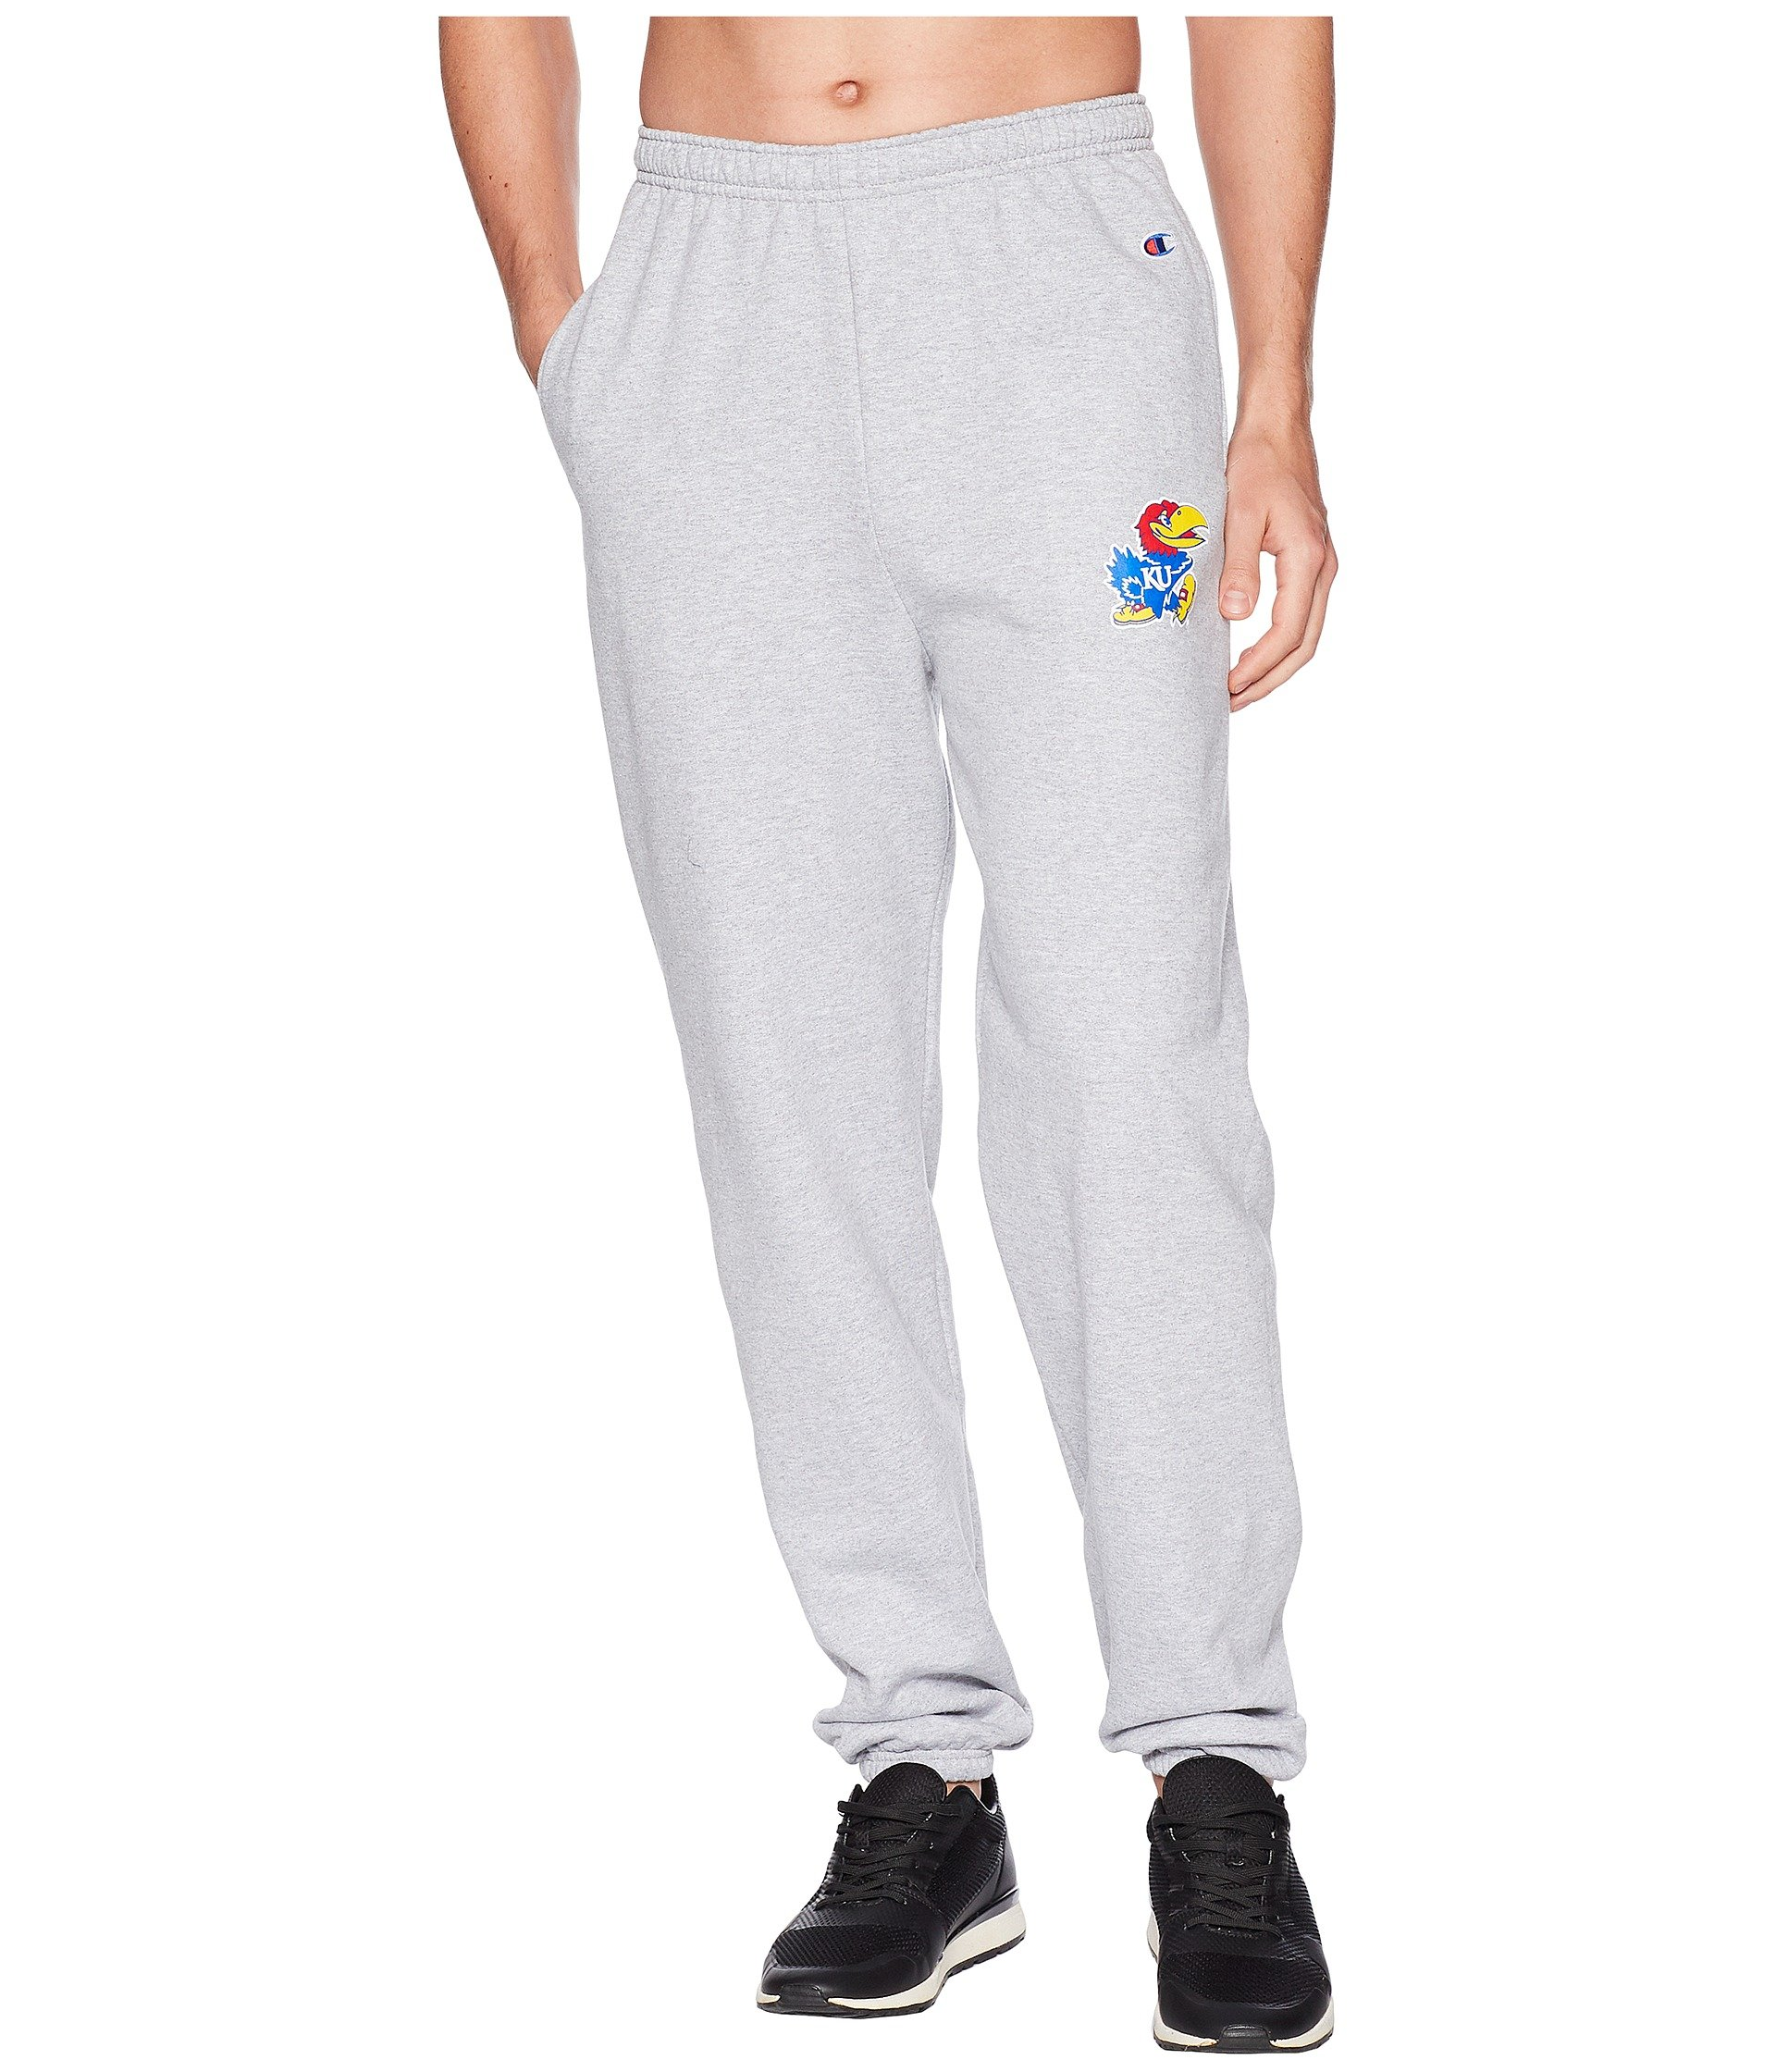 c5f055491ed97 Powerblend® Kansas College Grey Heher Banded Eco® Pants Champion Jayhawks  x7Iq5ppdw